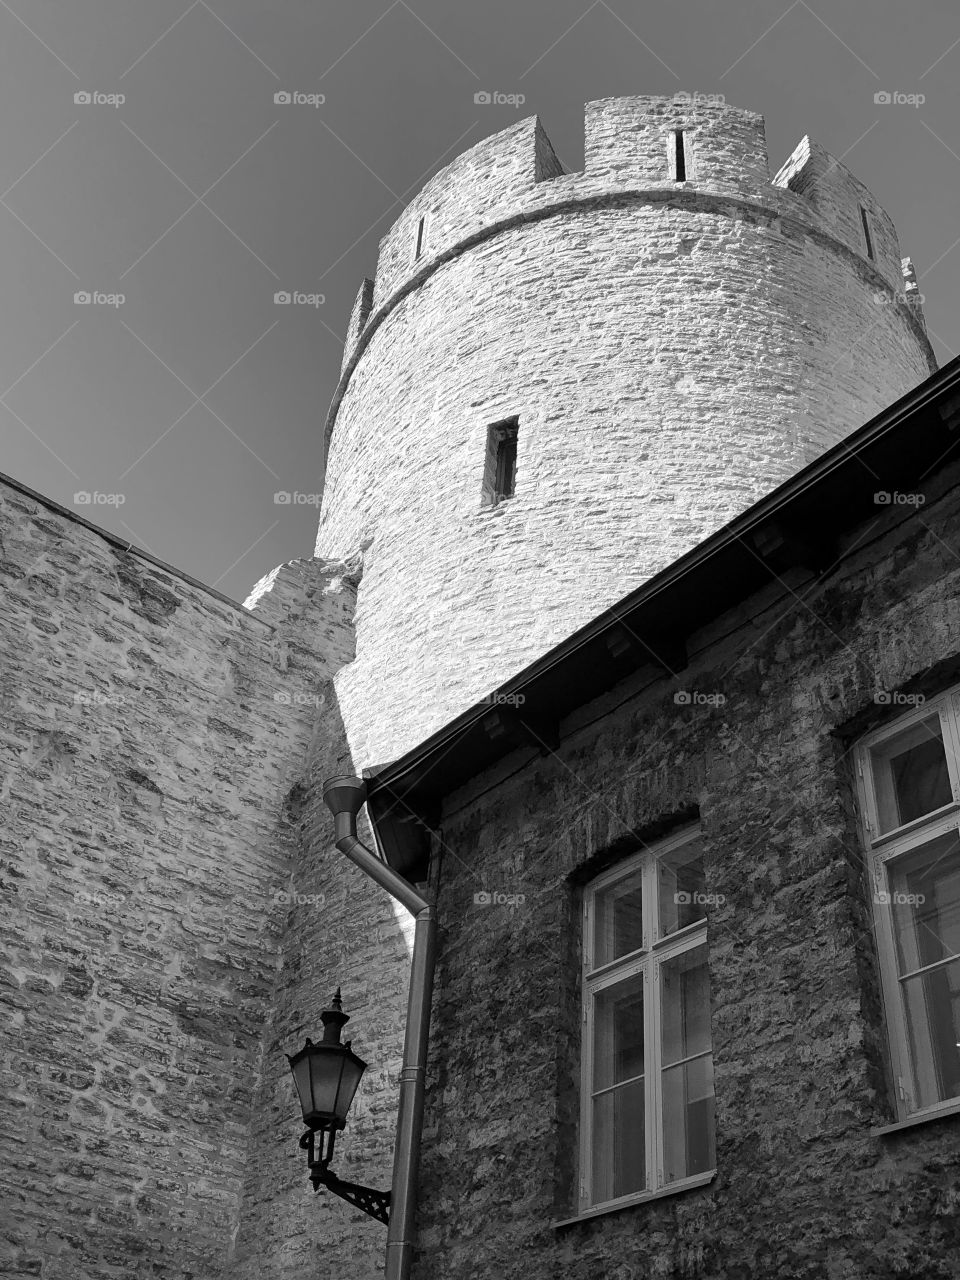 Bremen Tower in Tallinn Estonia